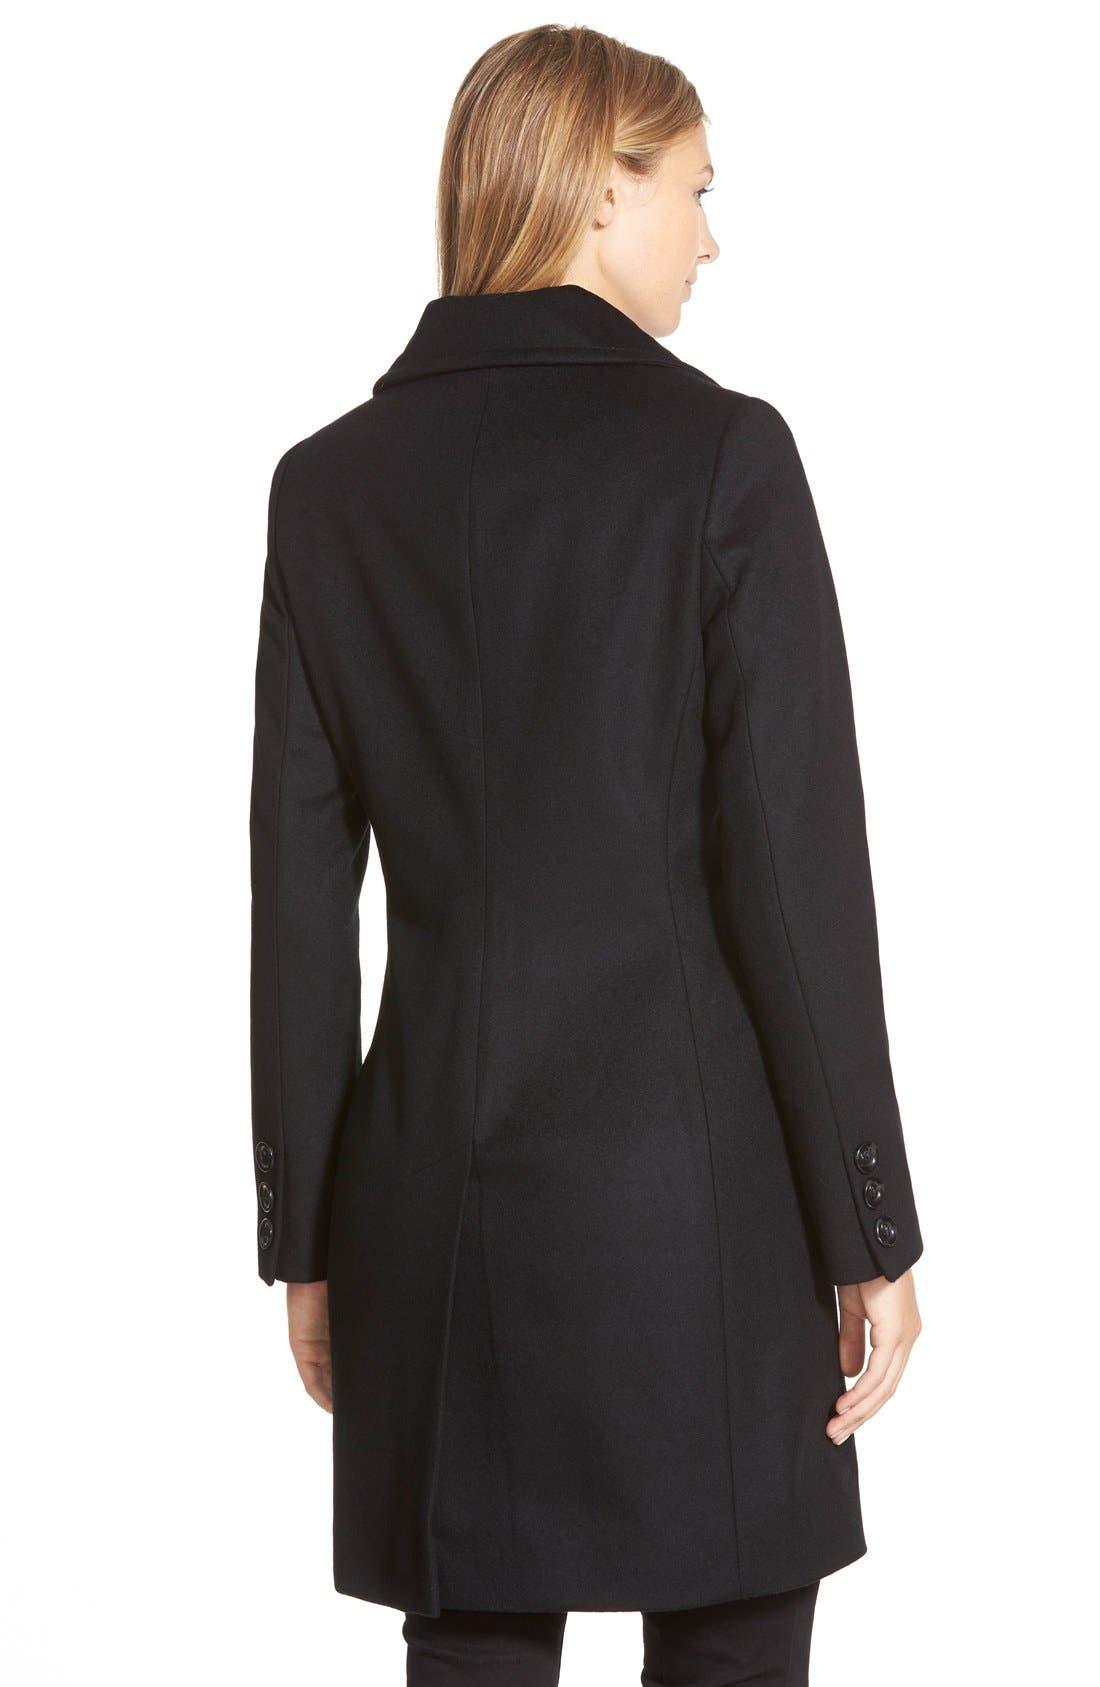 KRISTEN BLAKE, Single Breasted Wool Blend Coat, Alternate thumbnail 2, color, 001